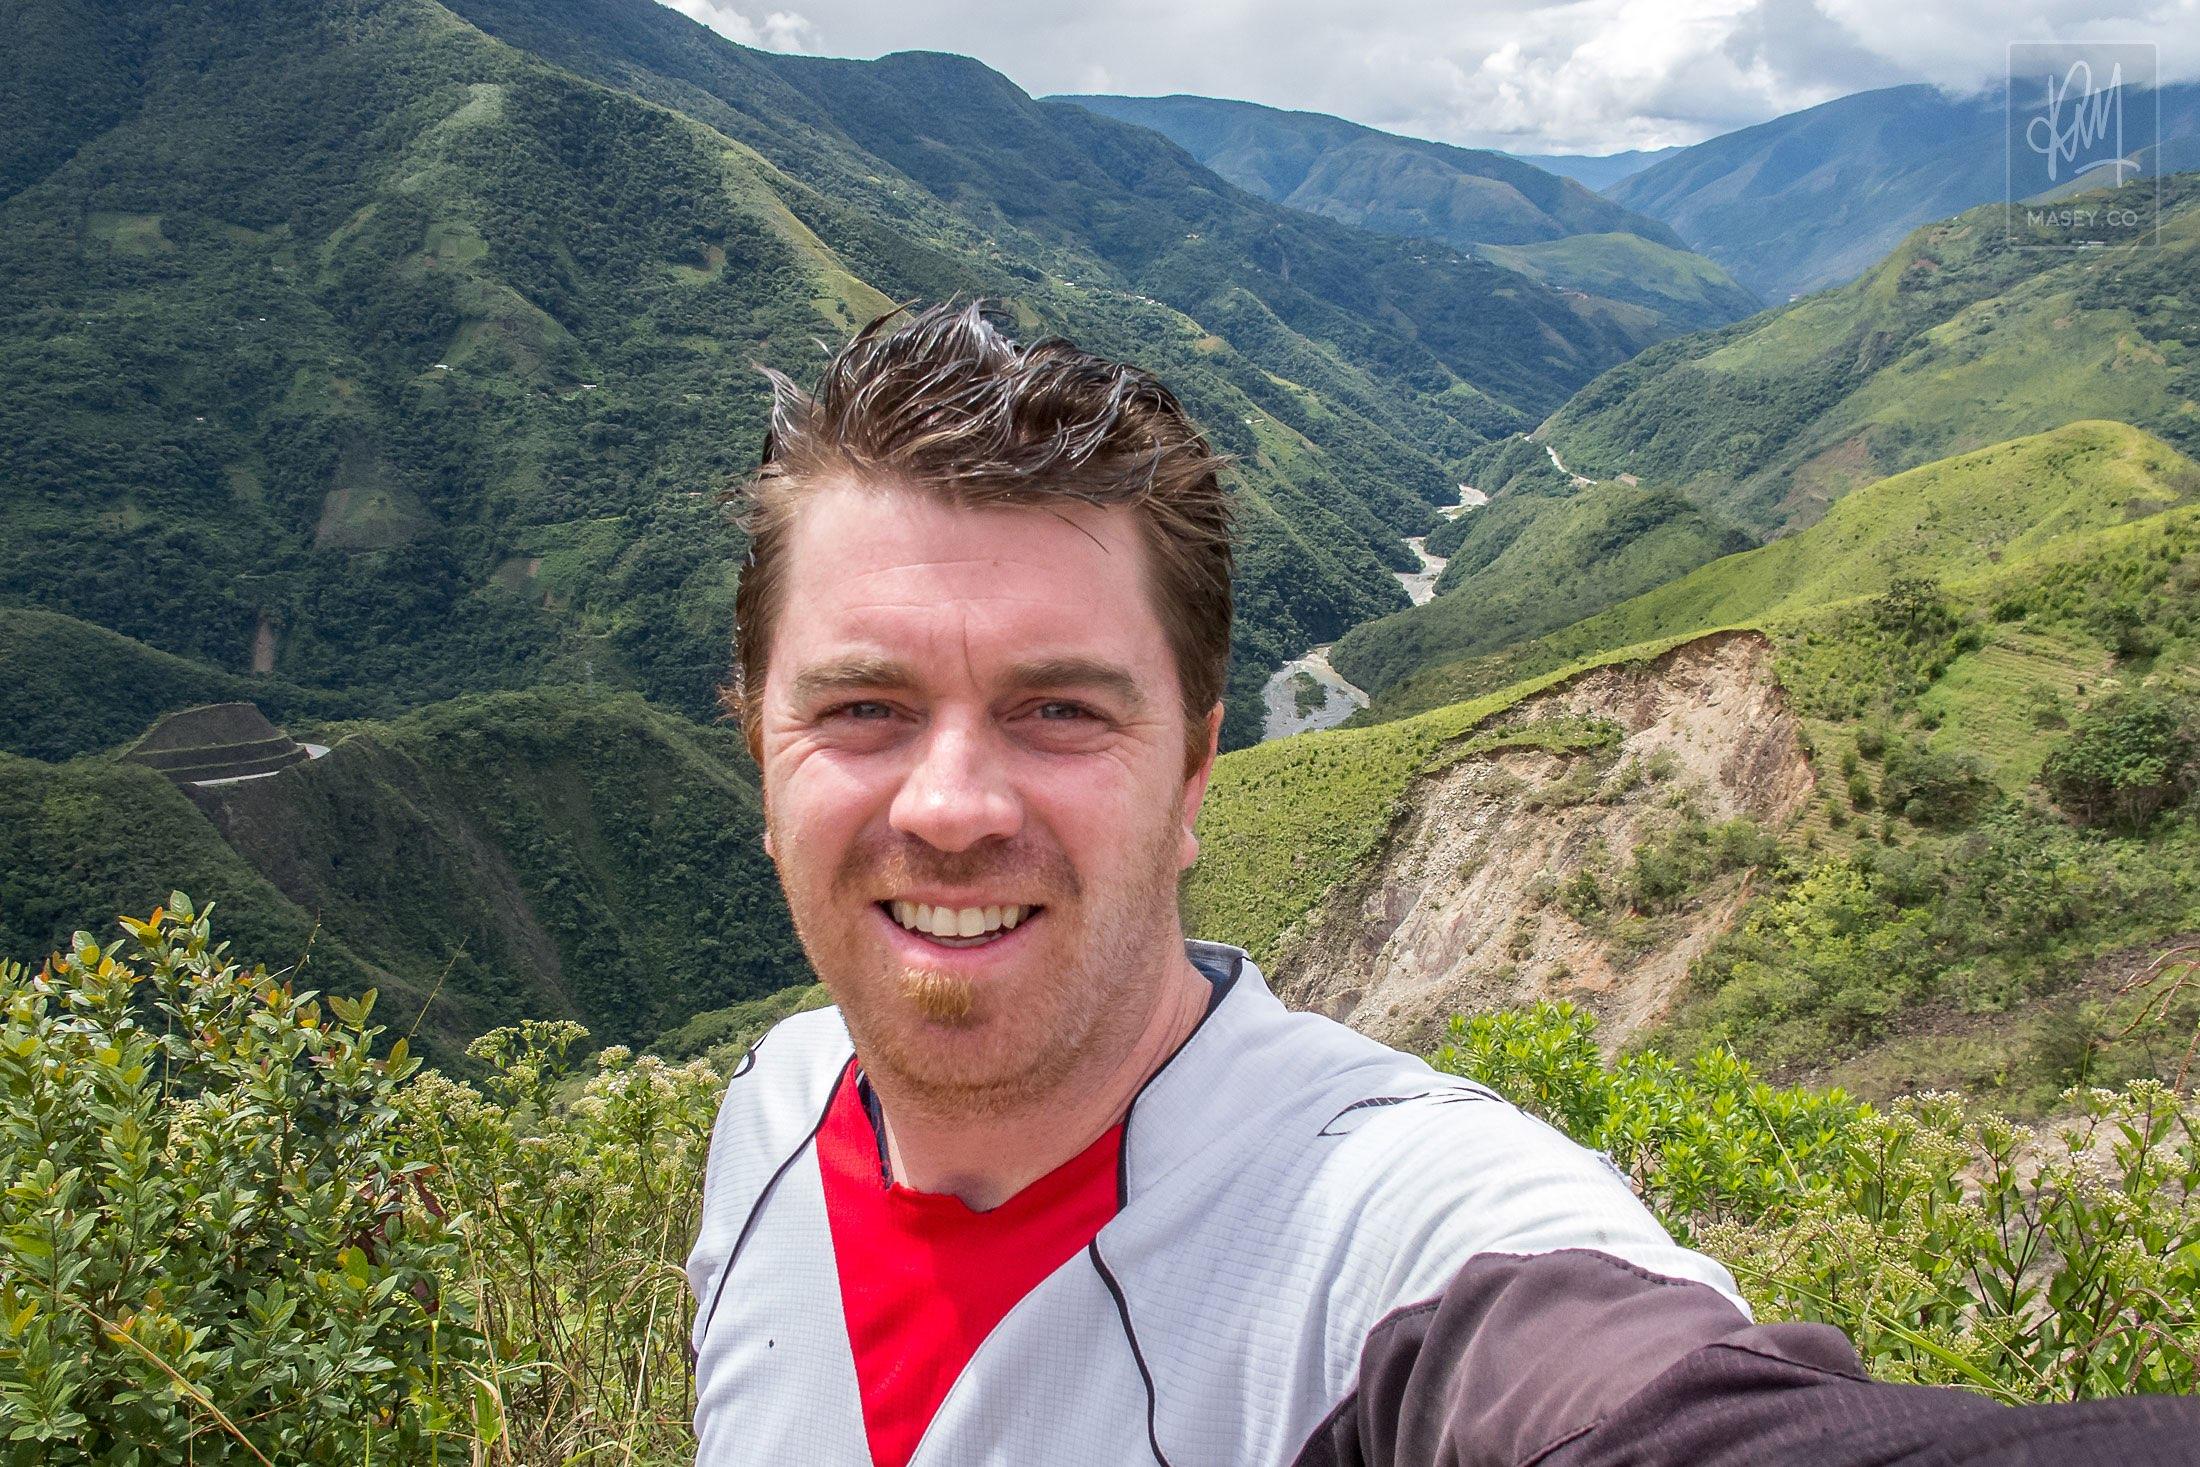 Mountain biking down Bolivia's famed Death Road